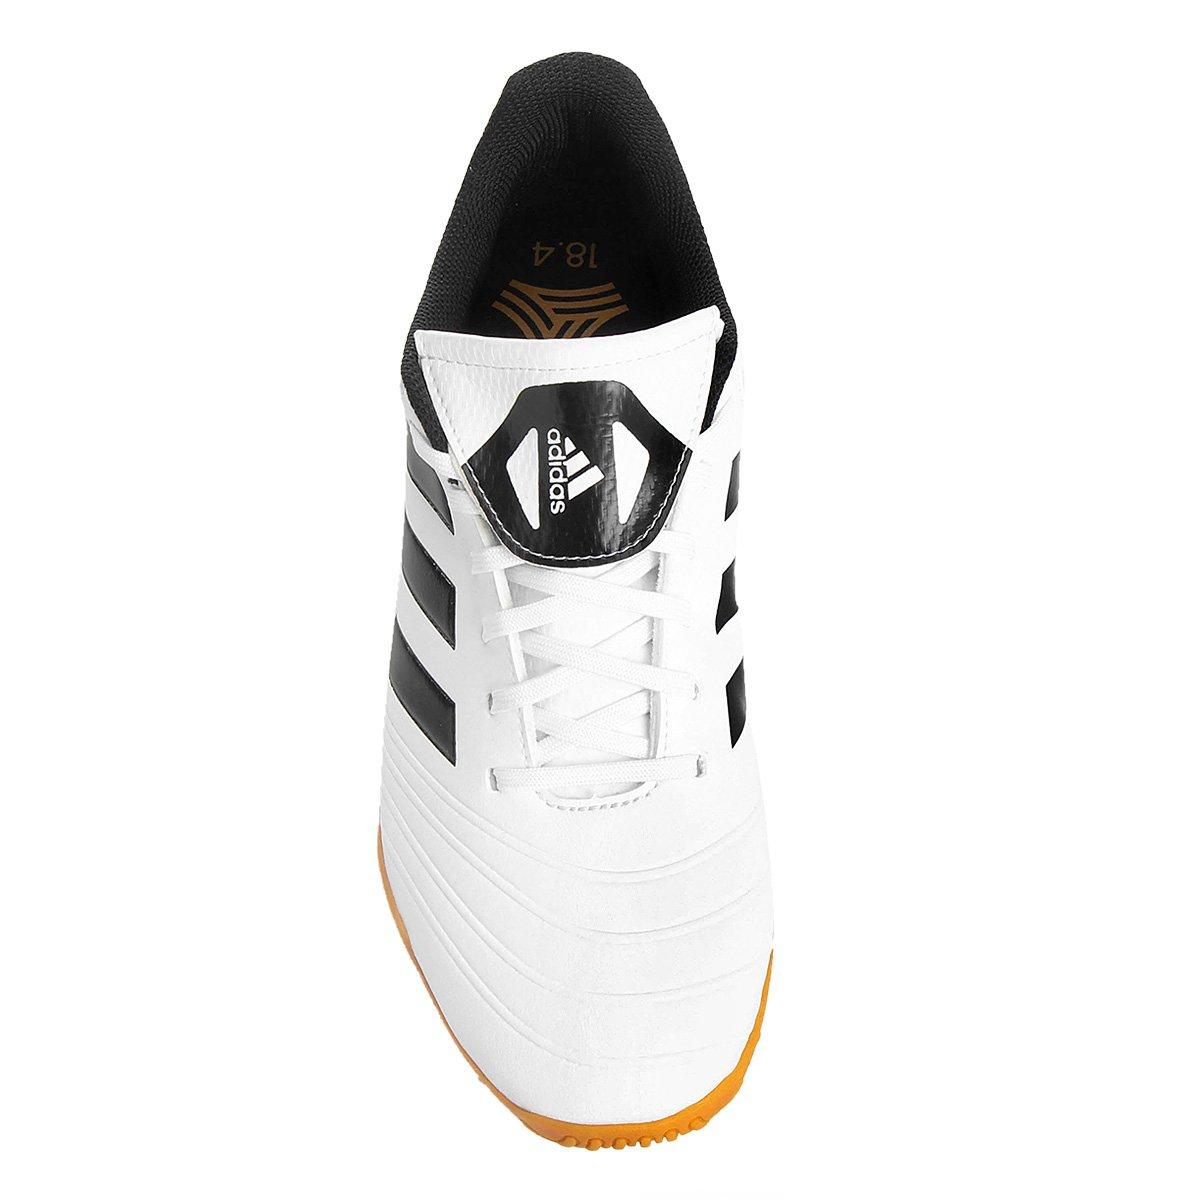 Chuteira Futsal Adidas Copa 18 4 In - Compre Agora  bbb63be27a68b